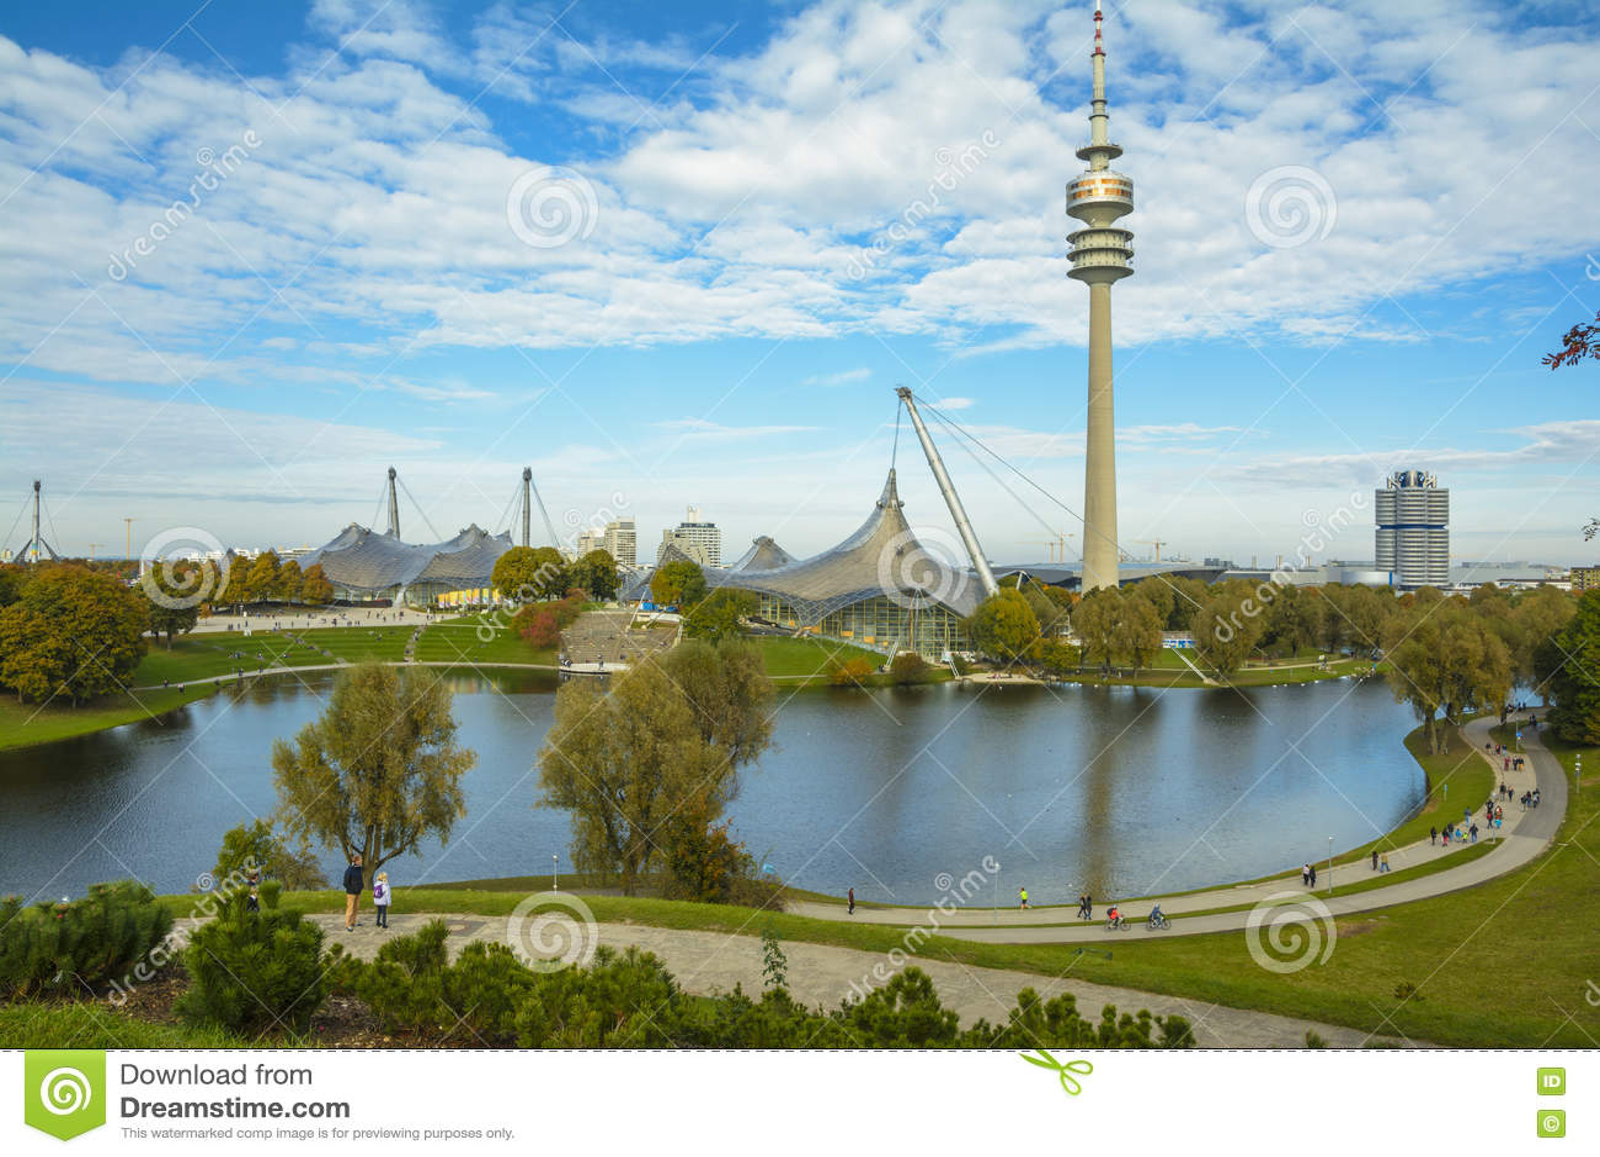 Olympiapark In Munich Bavaria Germany Editorial Photo